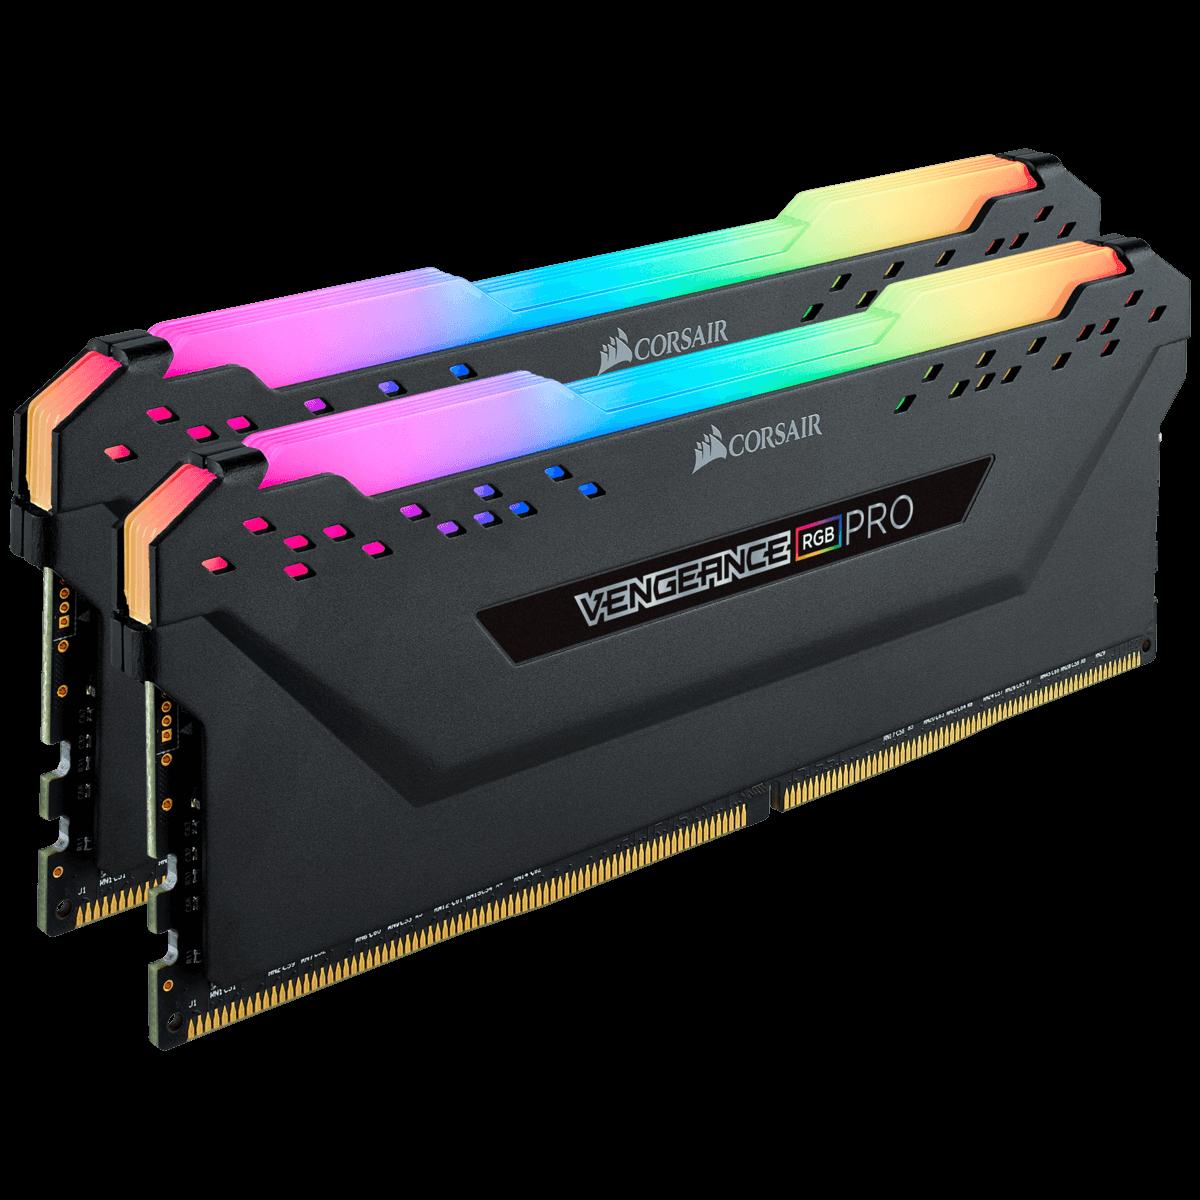 Memória DDR4 Corsair Vengeance RGB Pro, 16GB (2x8GB) 3200MHz, CL14, Black, CMW16GX4M2C3200C14